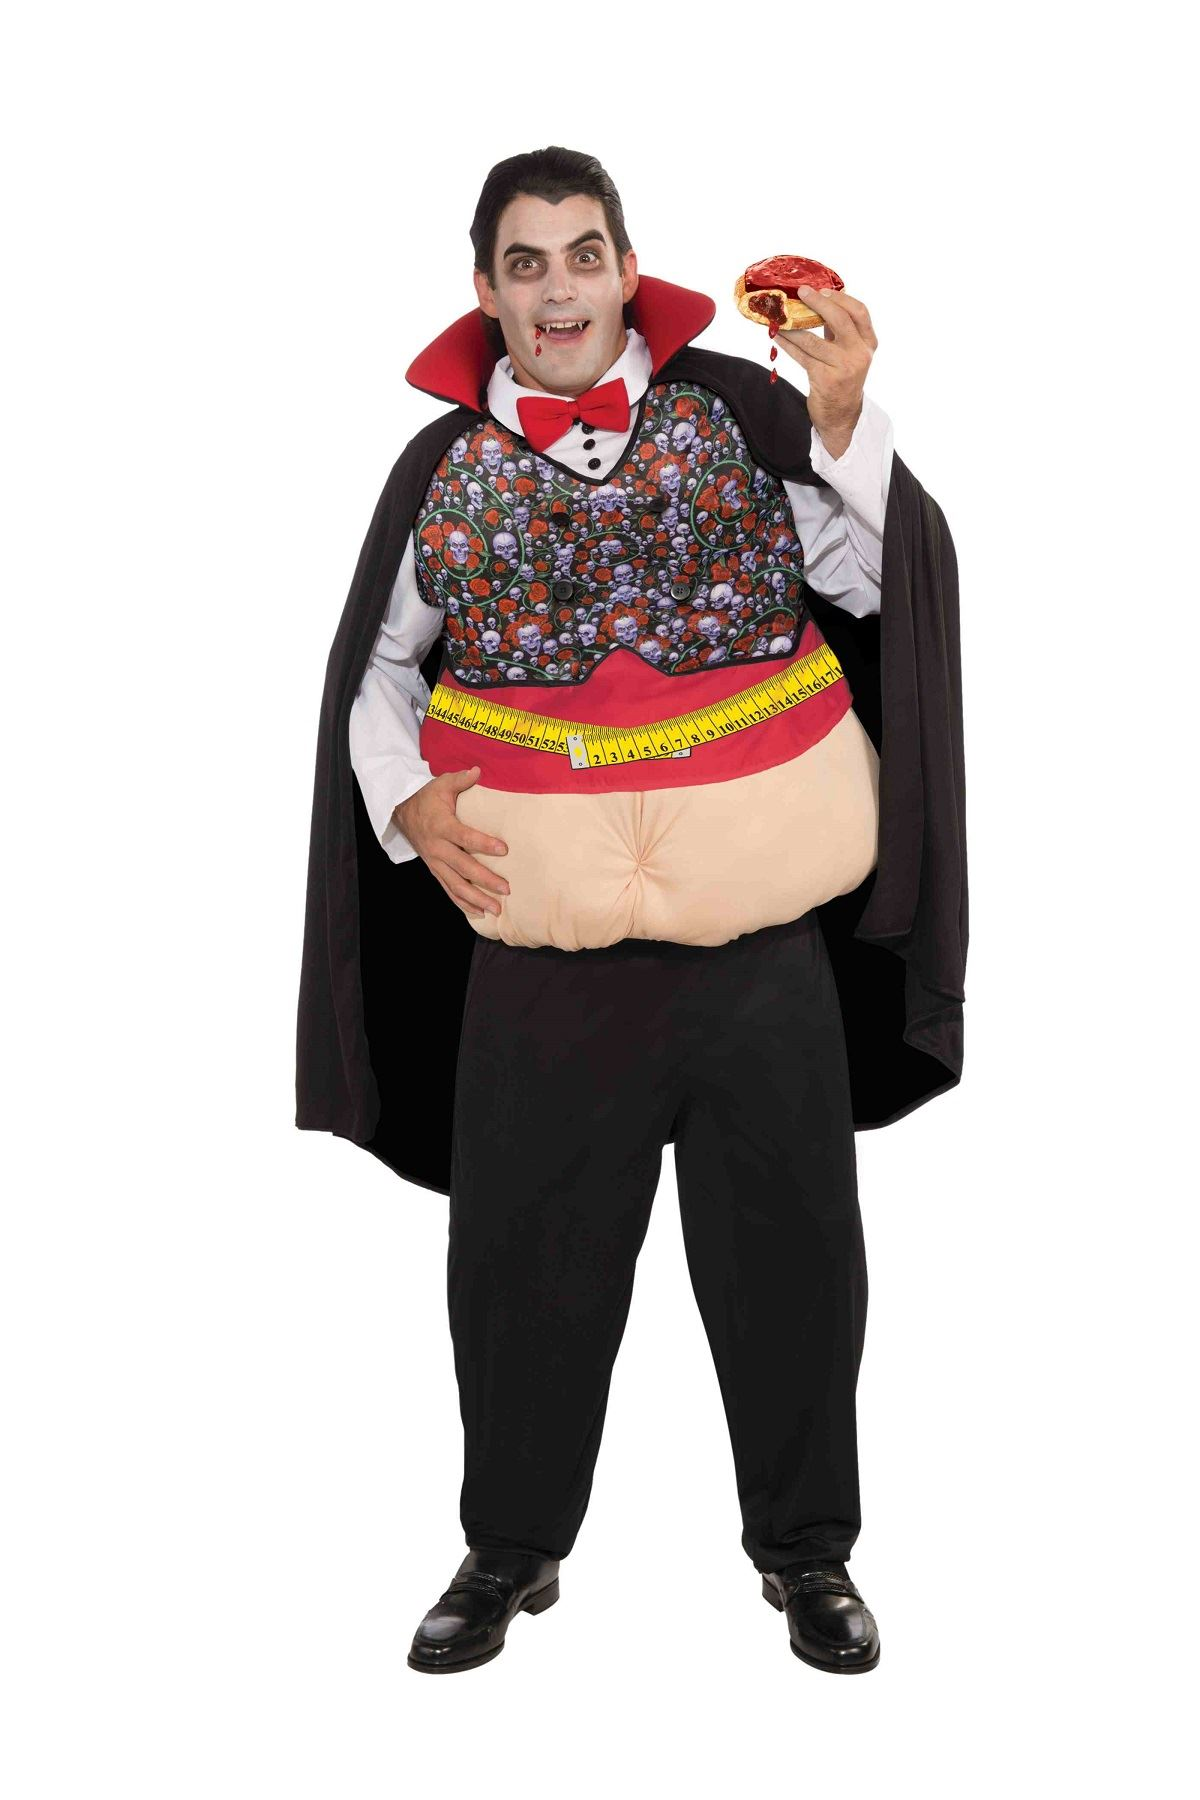 Adult Count The Calories Men Funny Halloween Costume  sc 1 st  The Costume Land & Adult Count The Calories Men Funny Halloween Costume | $36.99 | The ...